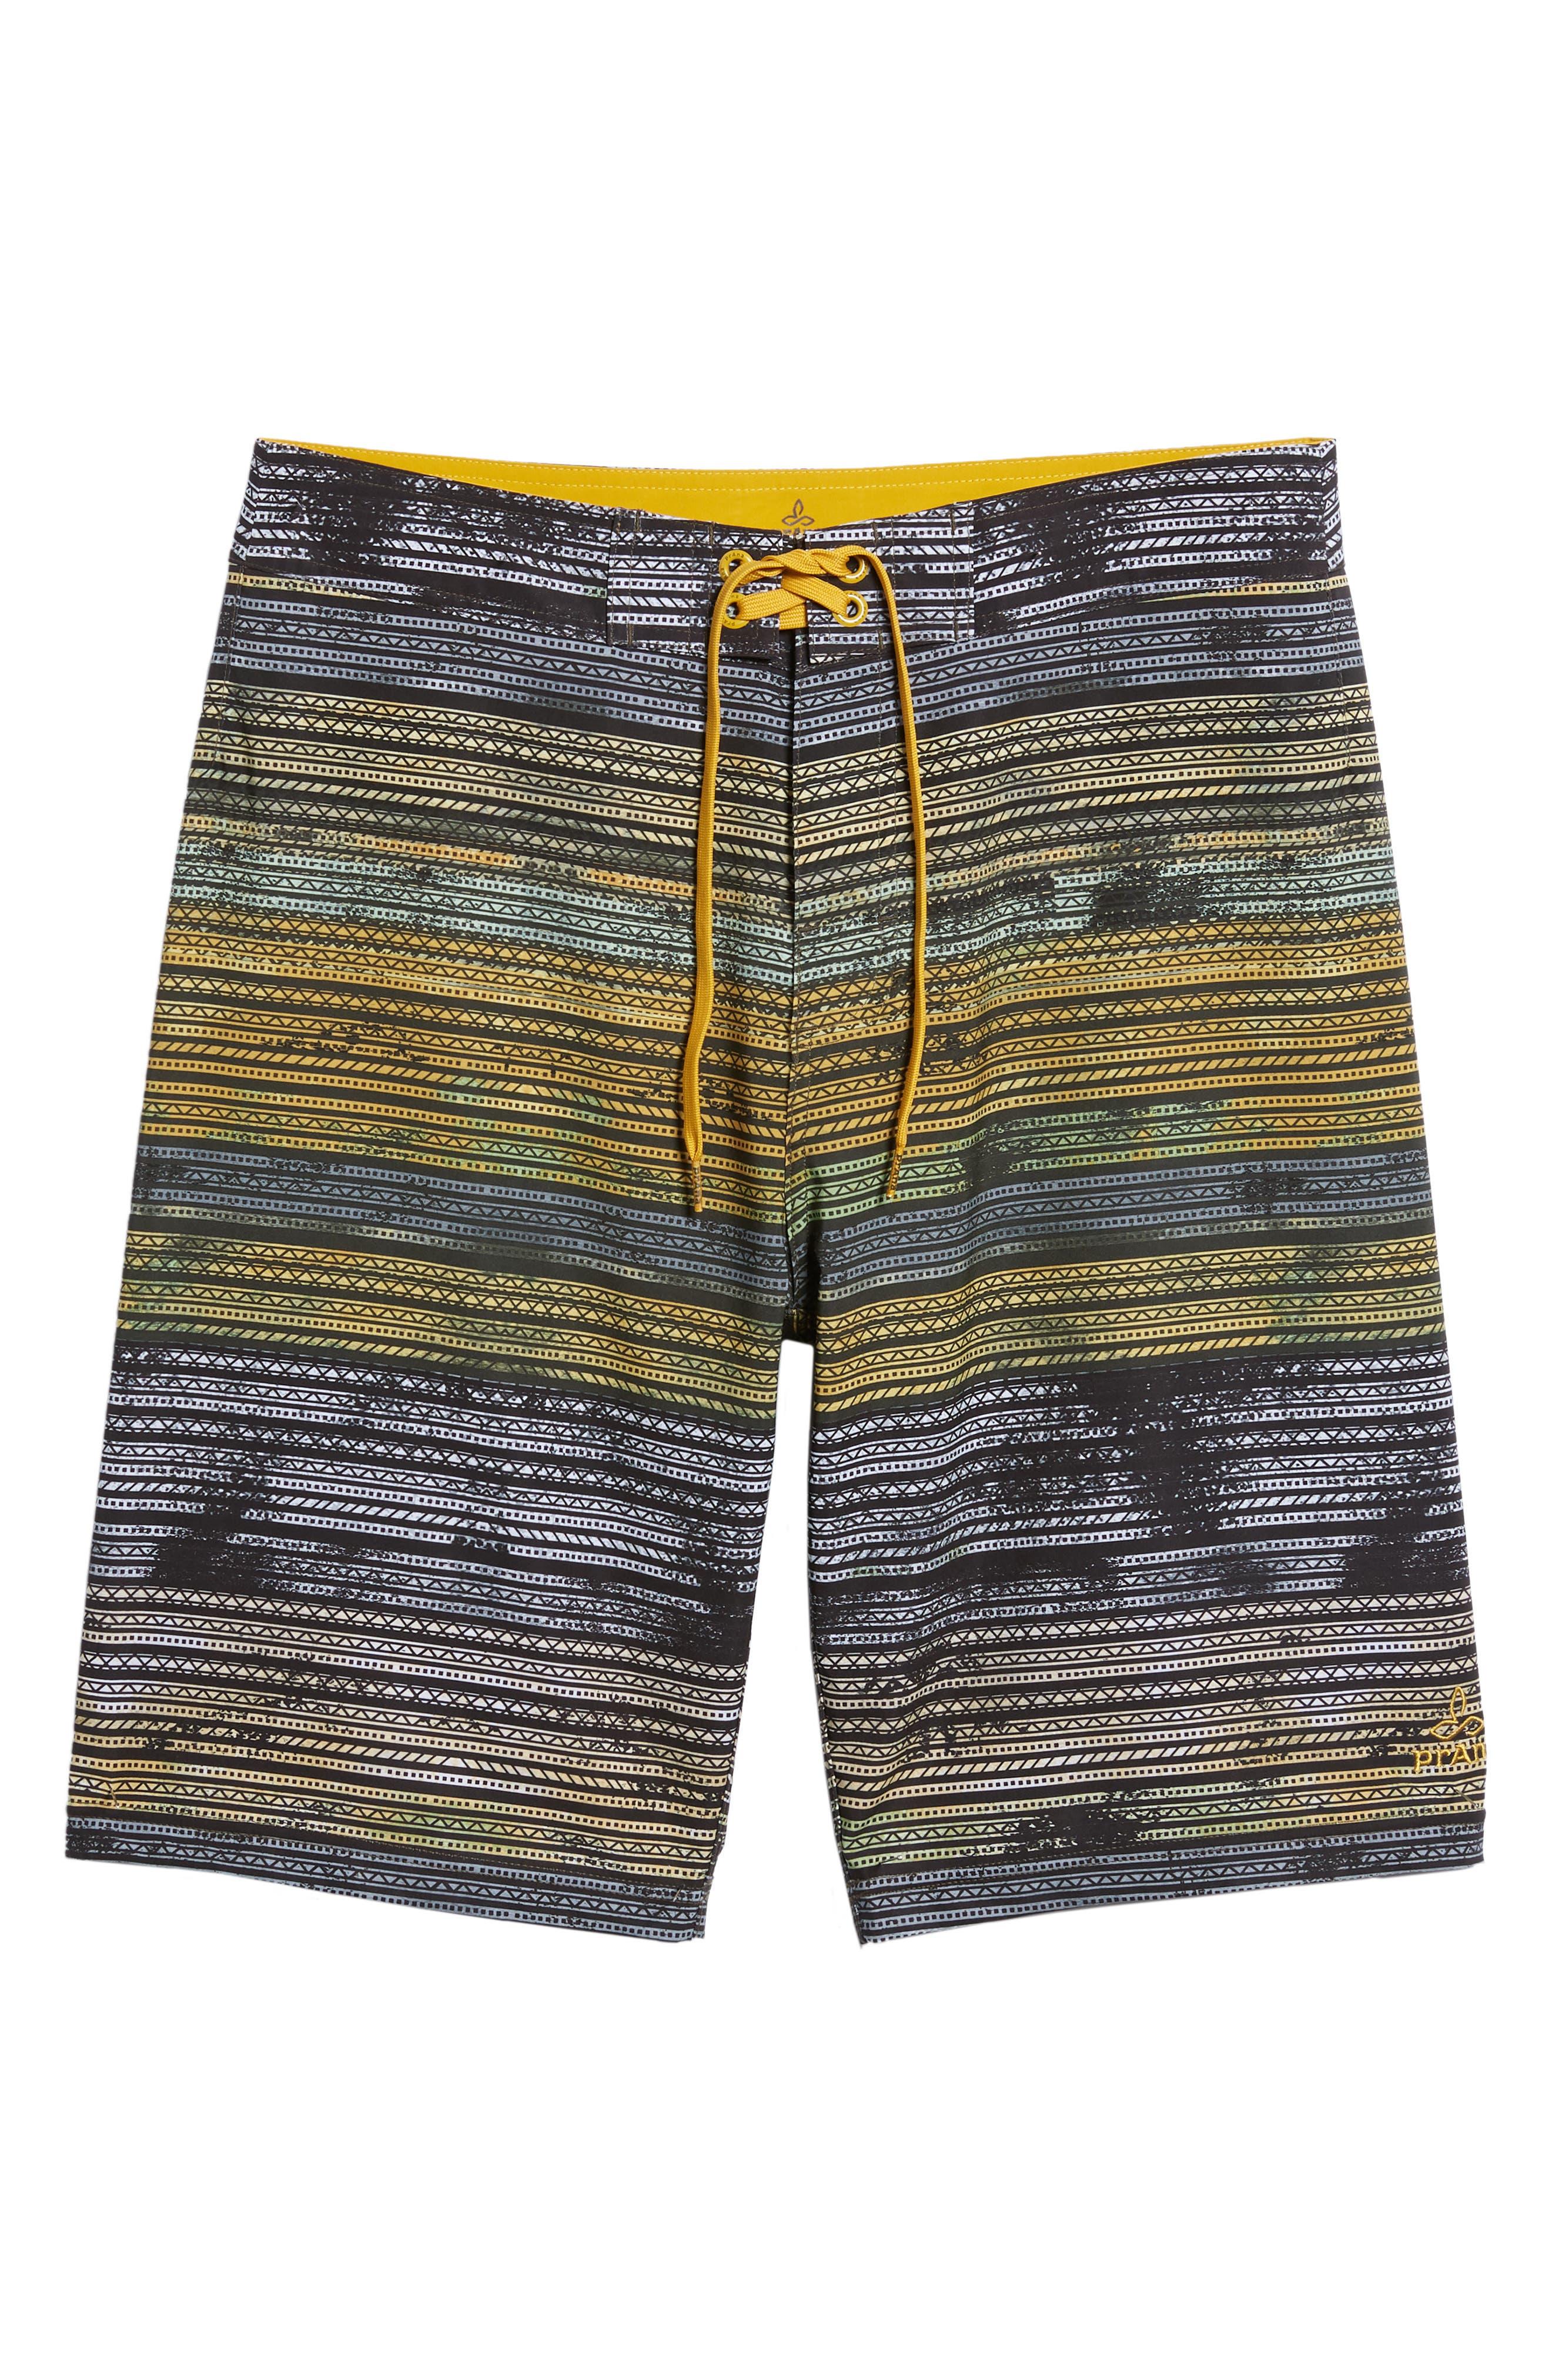 'Sediment' Stretch Board Shorts,                             Alternate thumbnail 79, color,